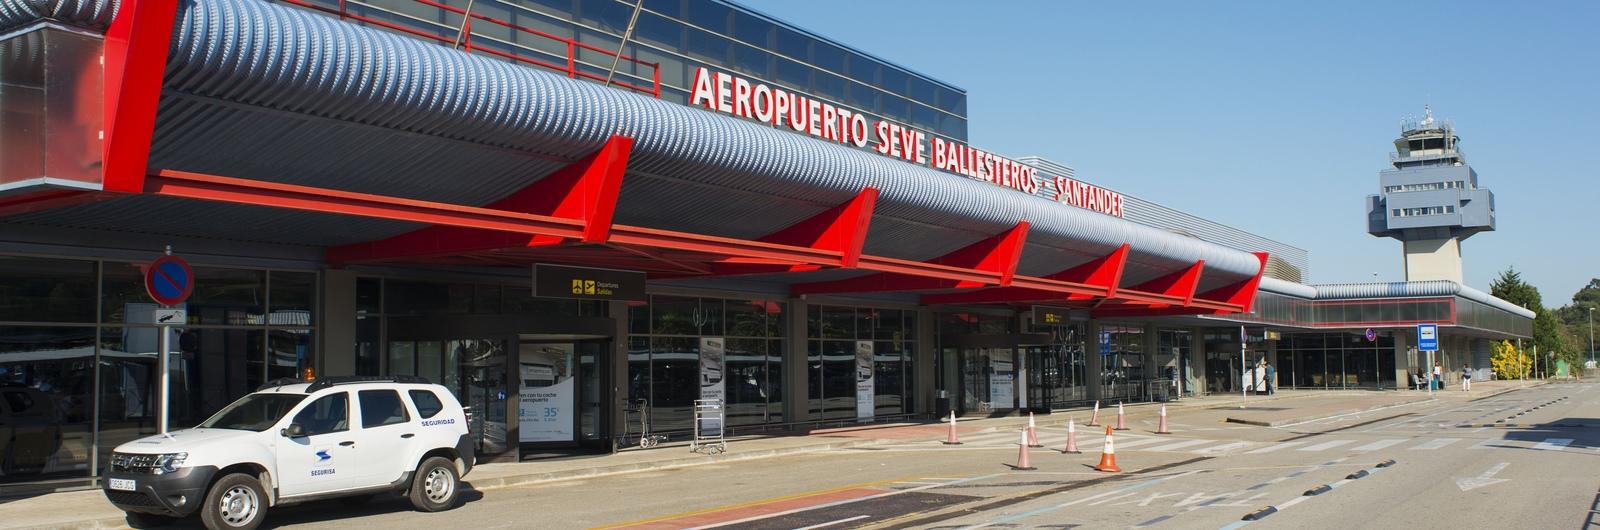 santander airport header